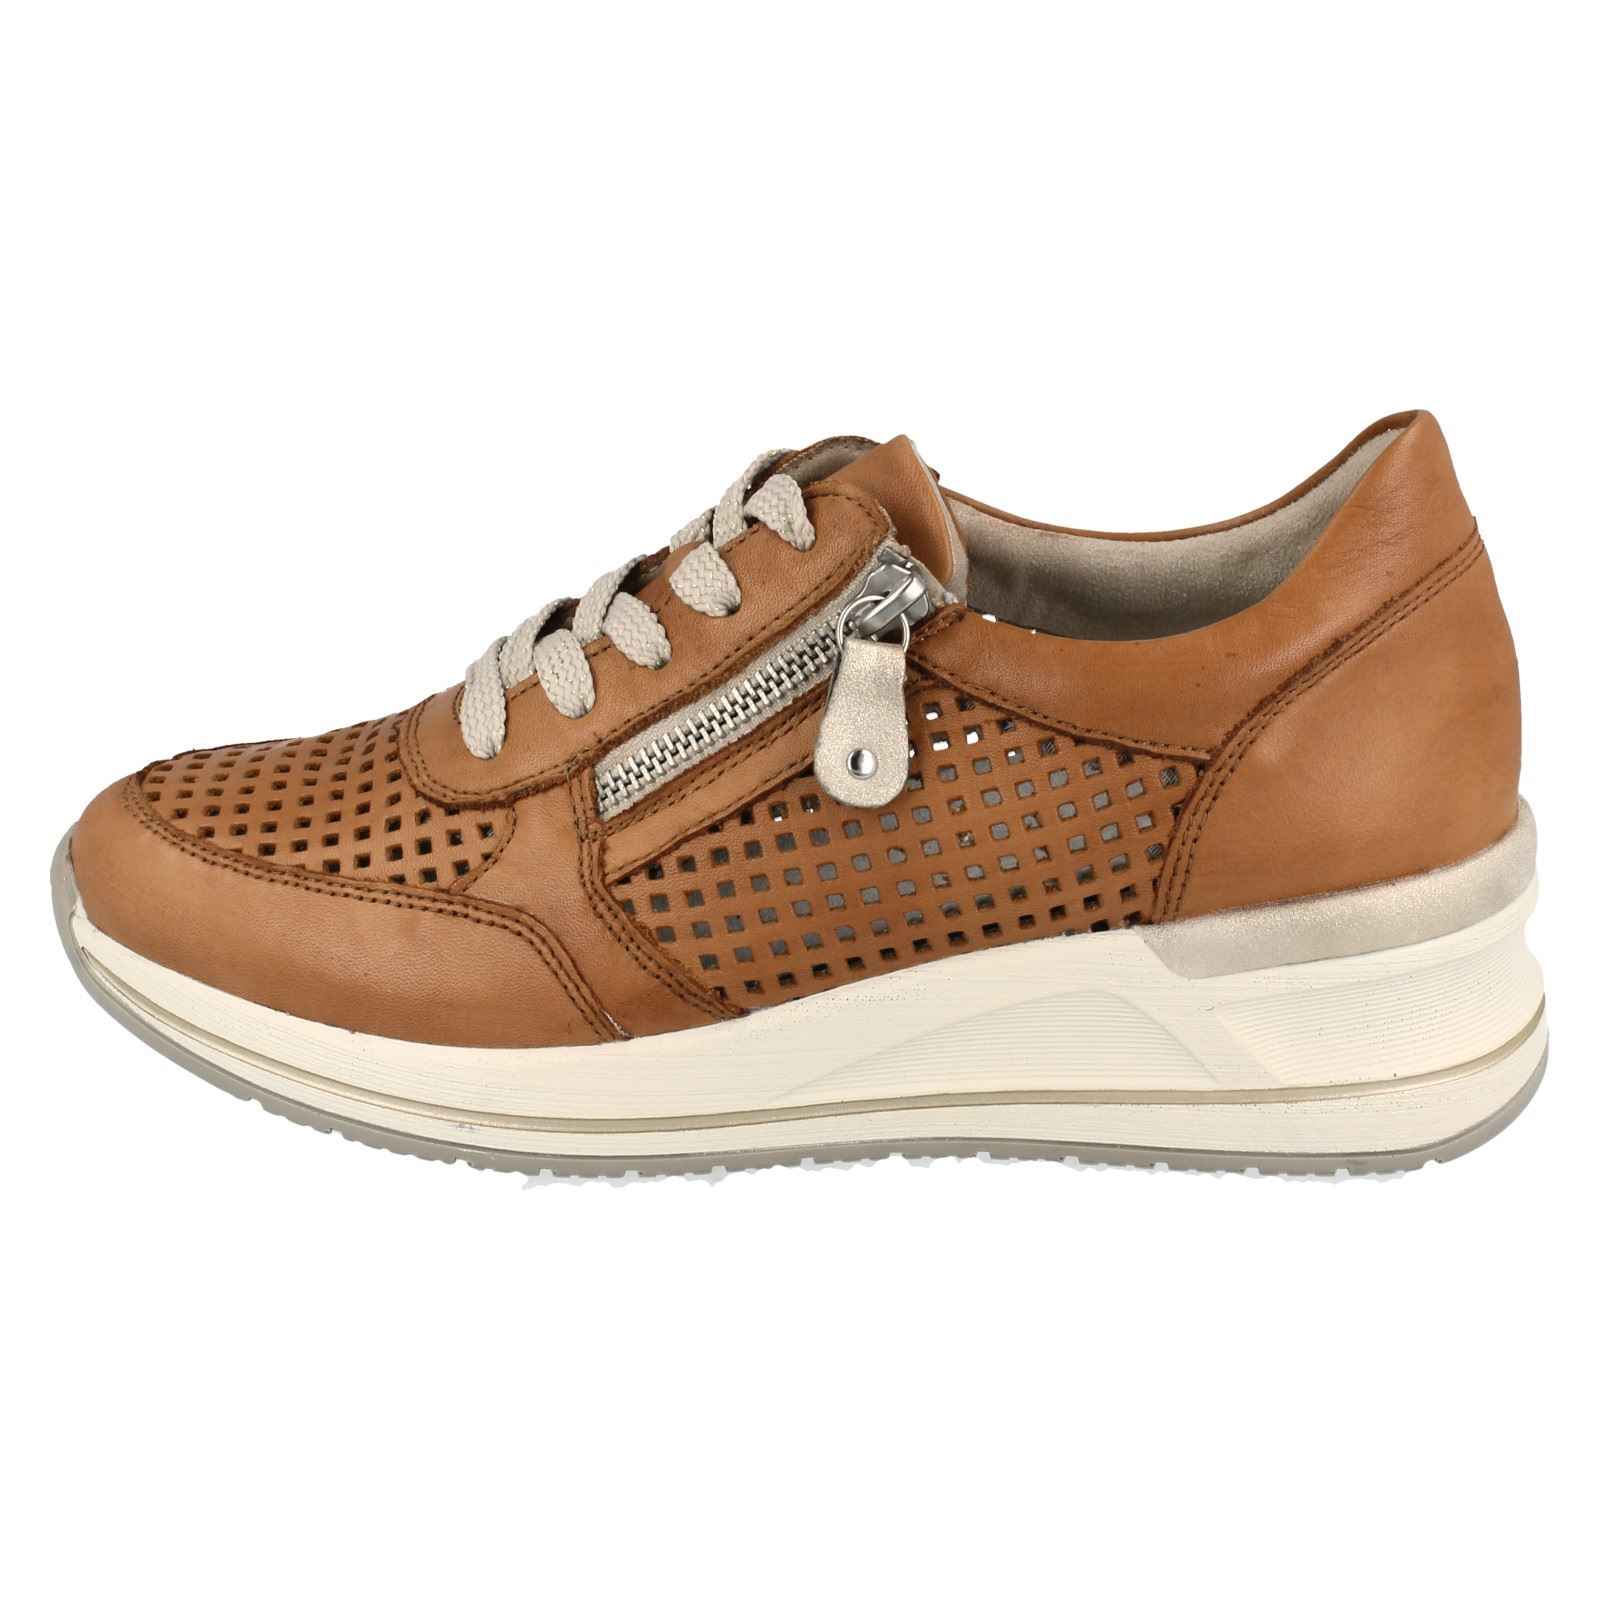 Remonte dame sneaker i brun